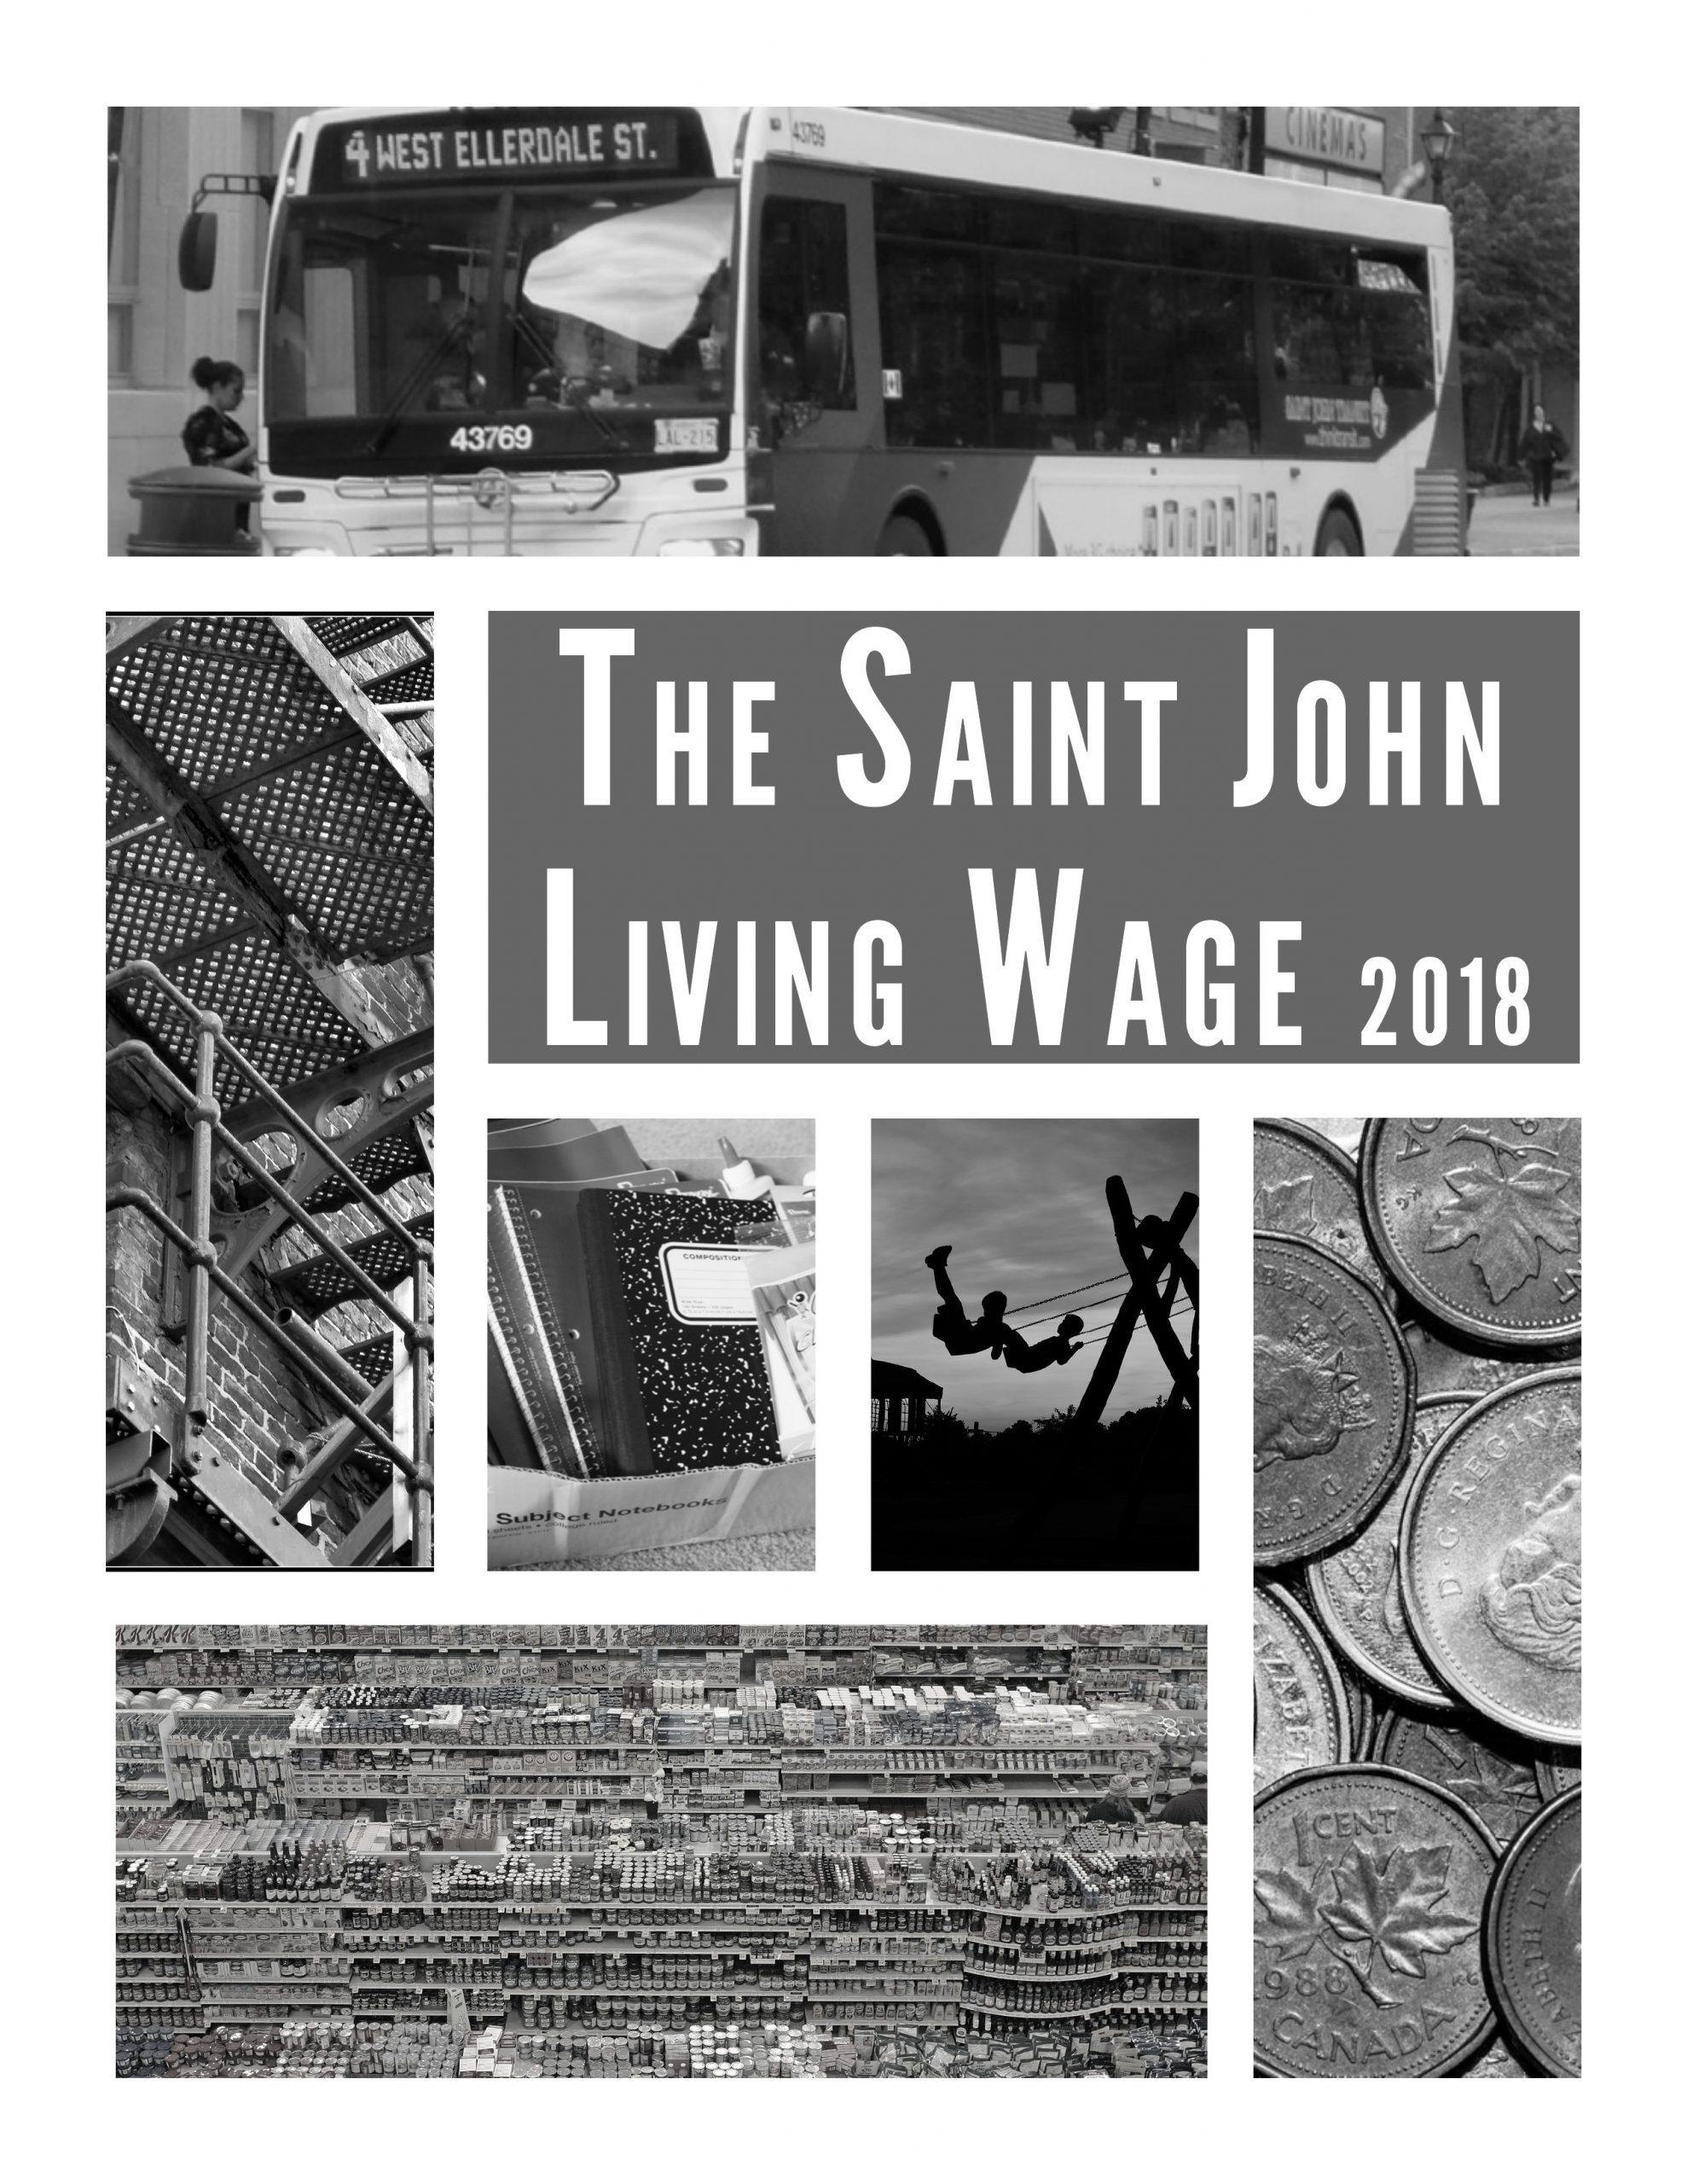 The Saint John Living Wage 2018